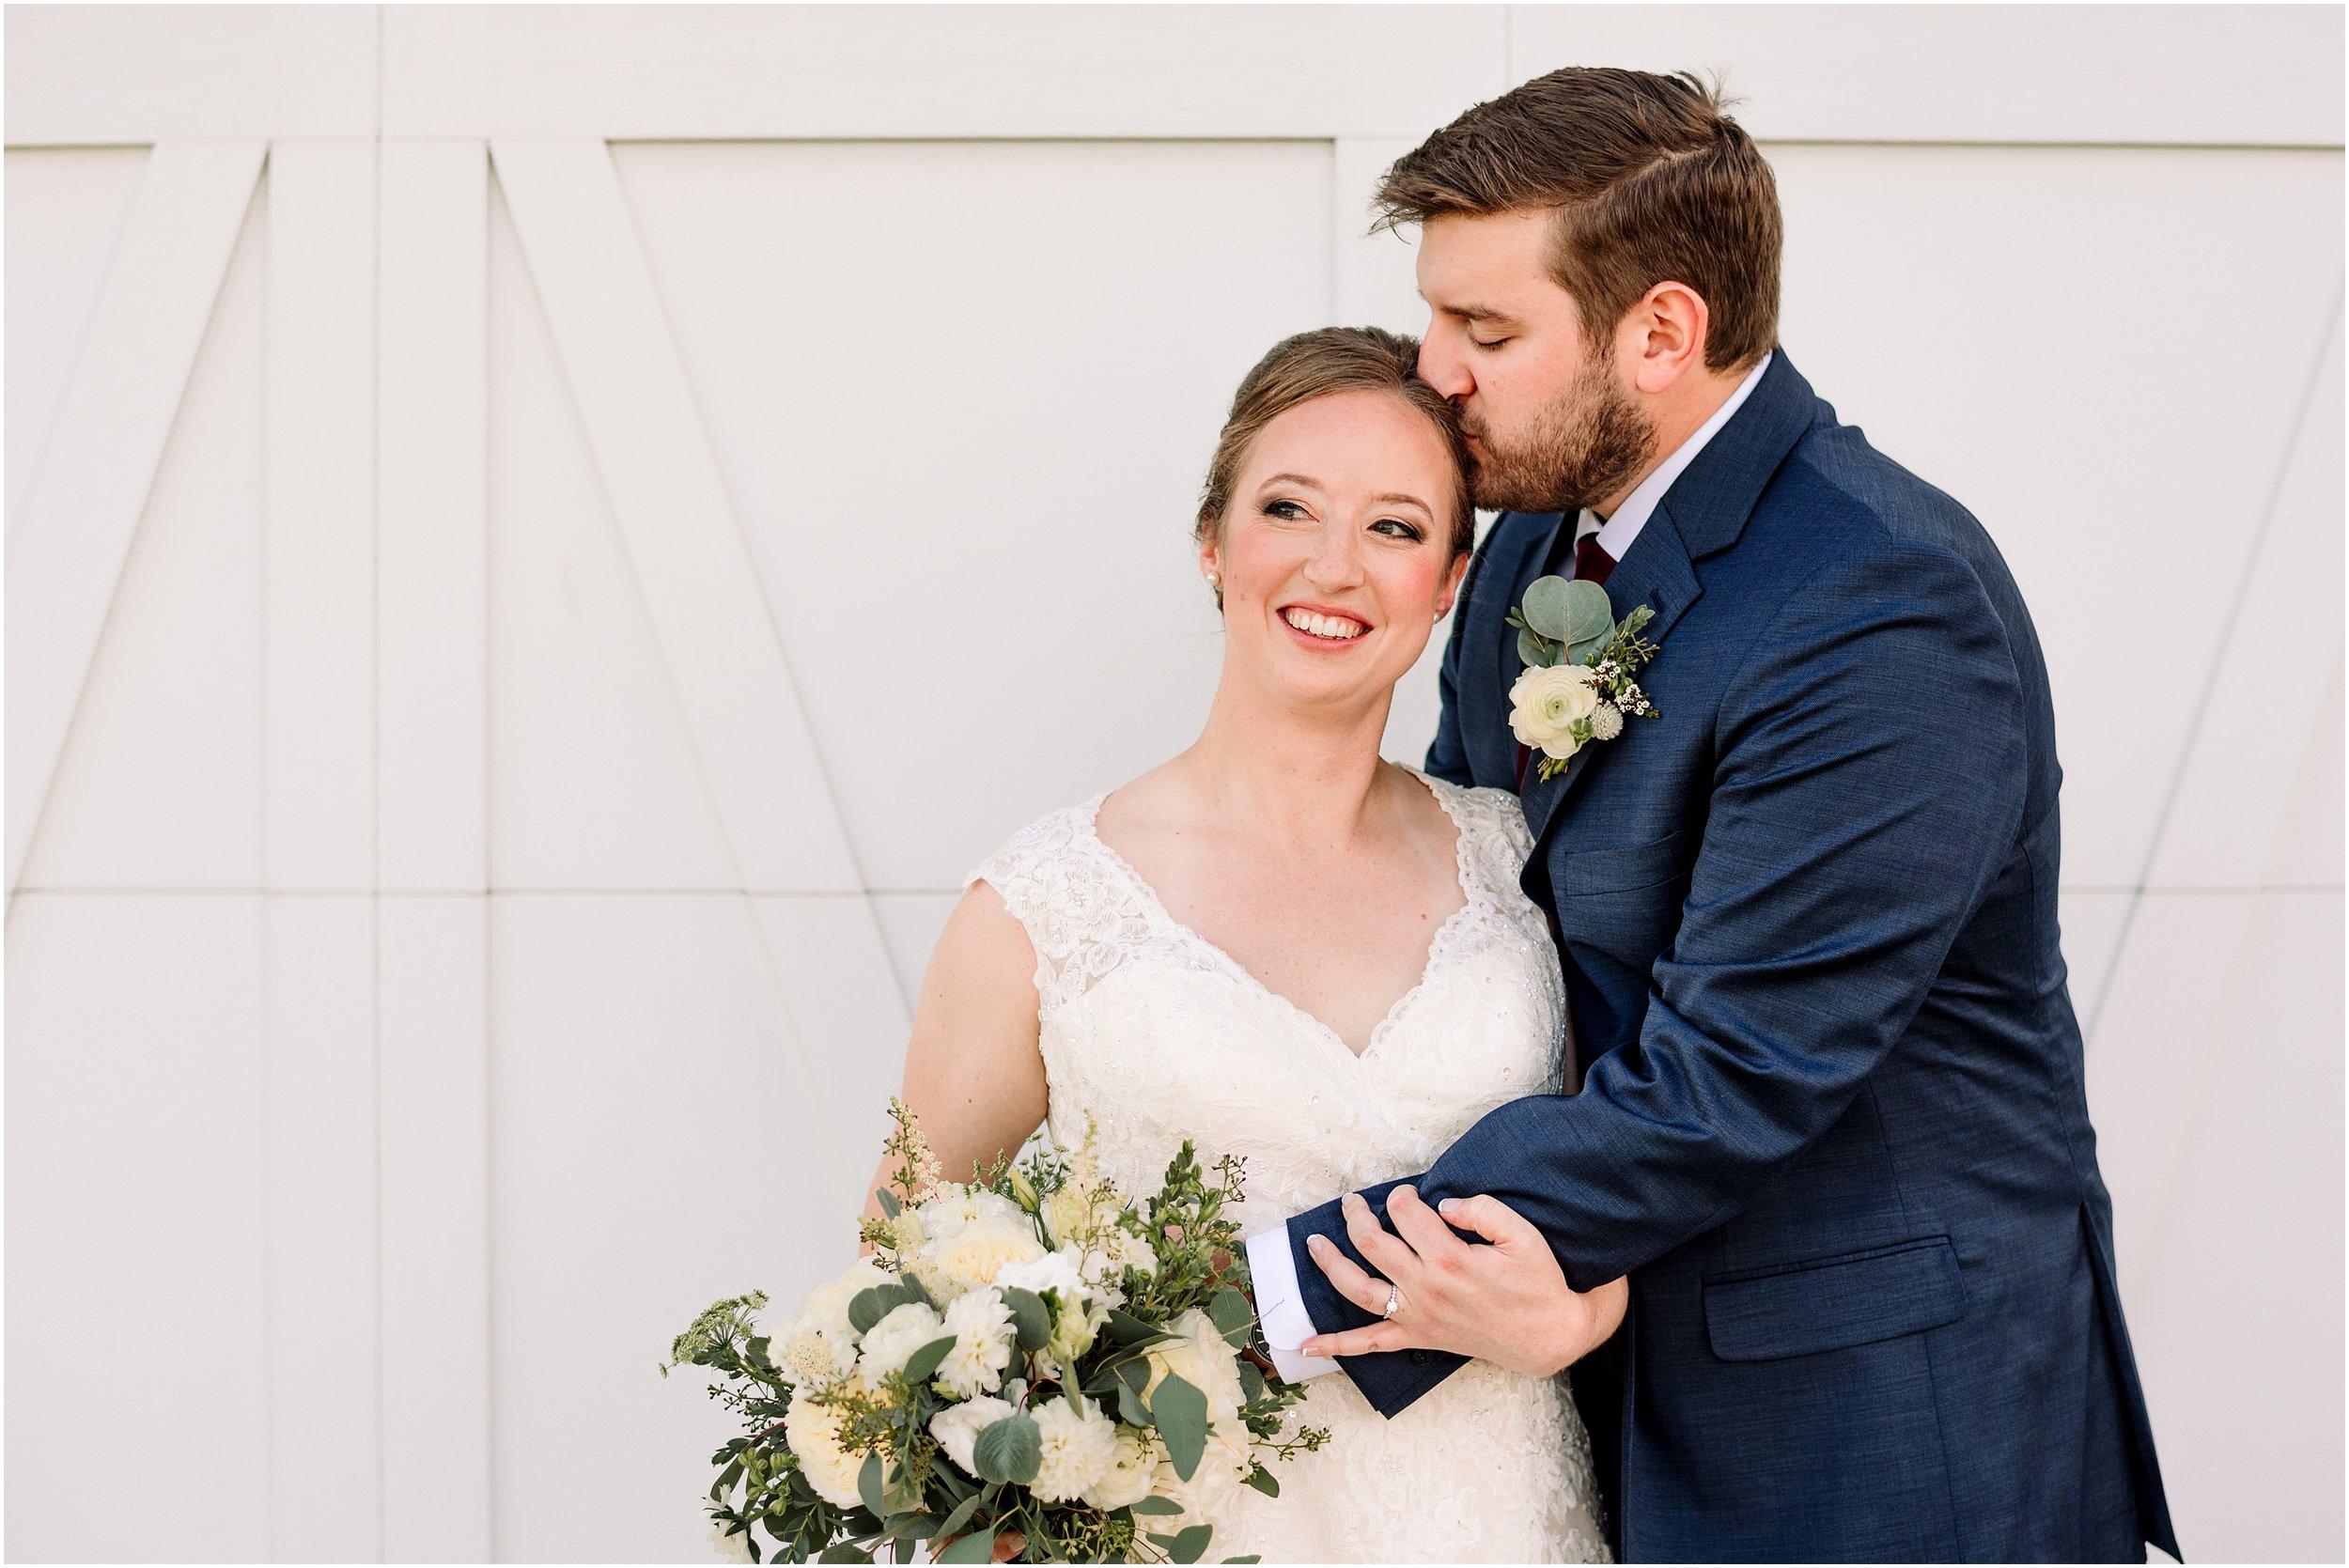 hannah leigh photography Wyndridge Farm Wedding York PA_1491.jpg